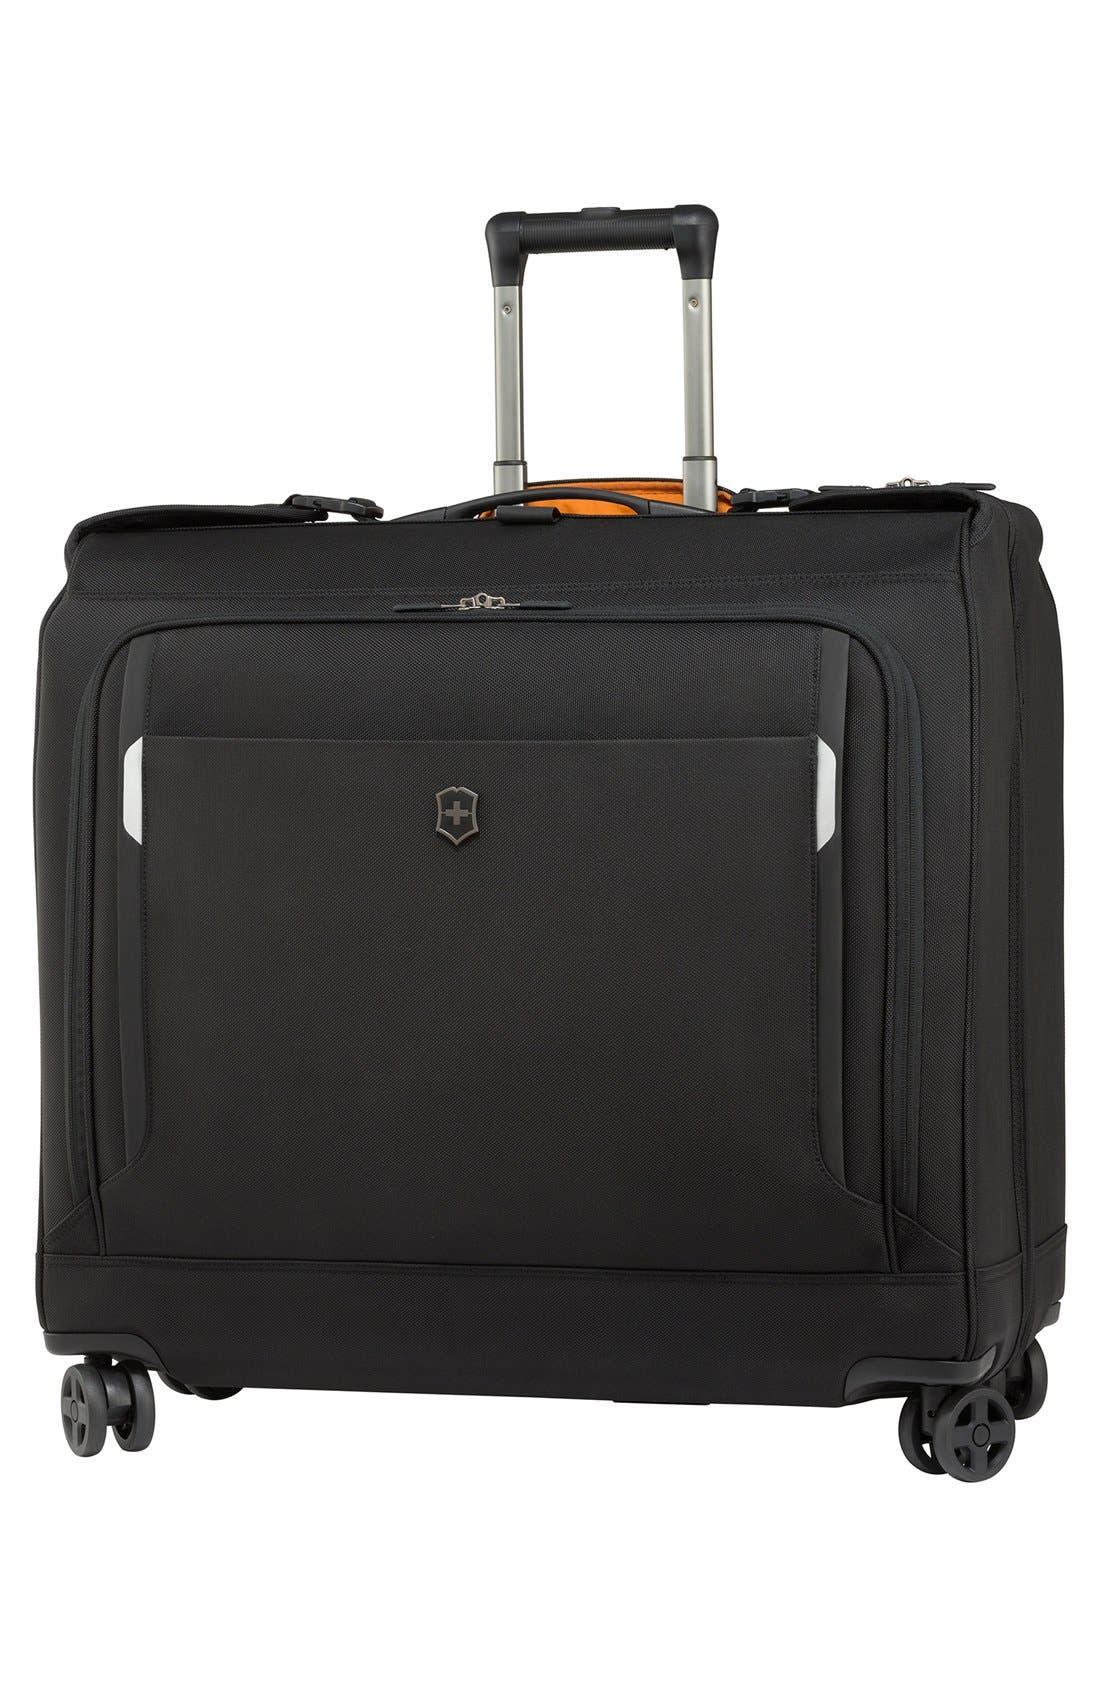 VICTORINOX SWISS ARMY<SUP>®</SUP> WT 5.0 Dual Caster Wheeled Garment Bag